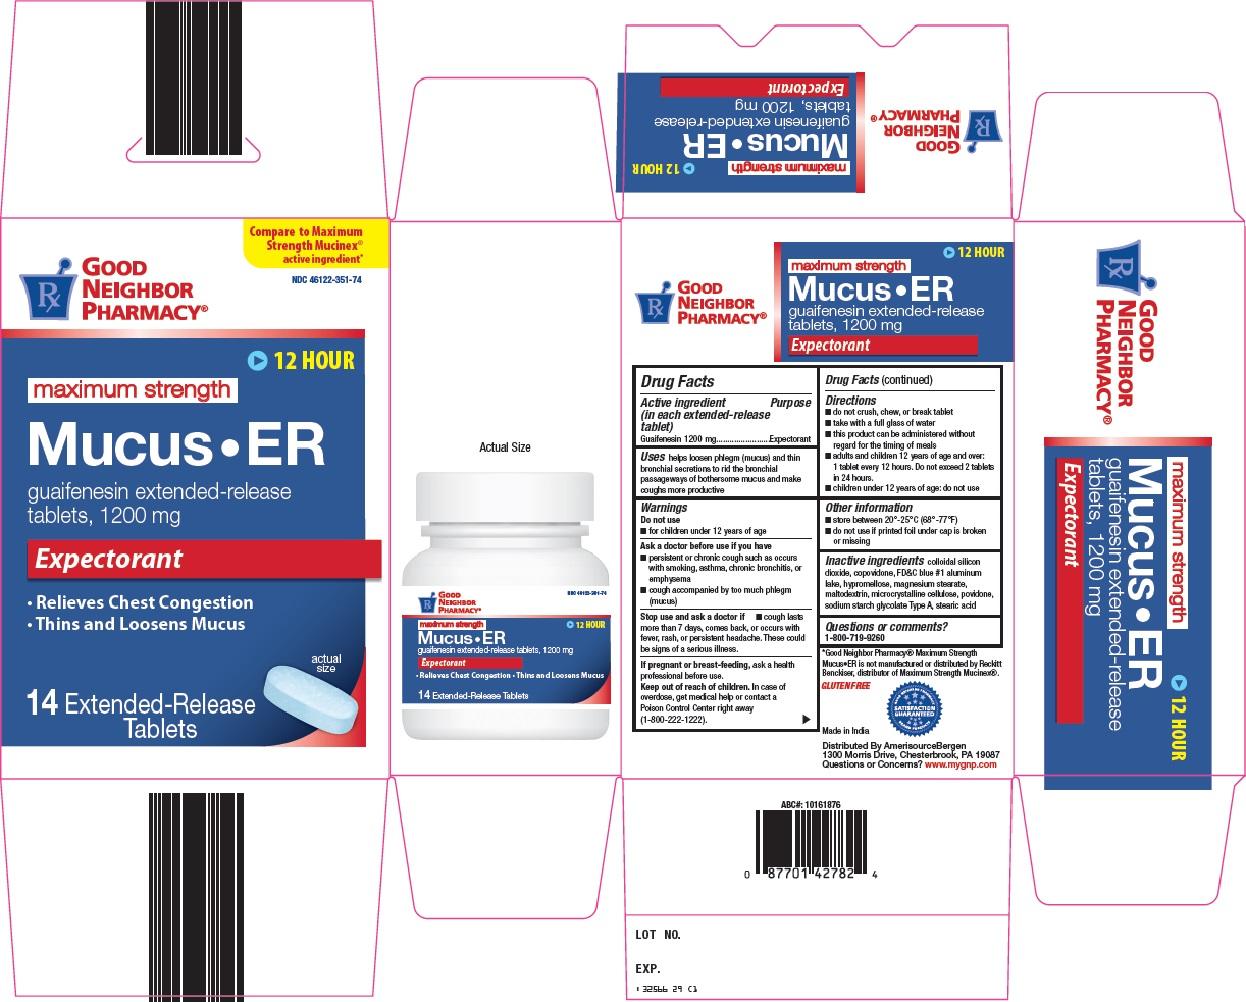 Good Neighbor Pharmacy Mucus - ER image